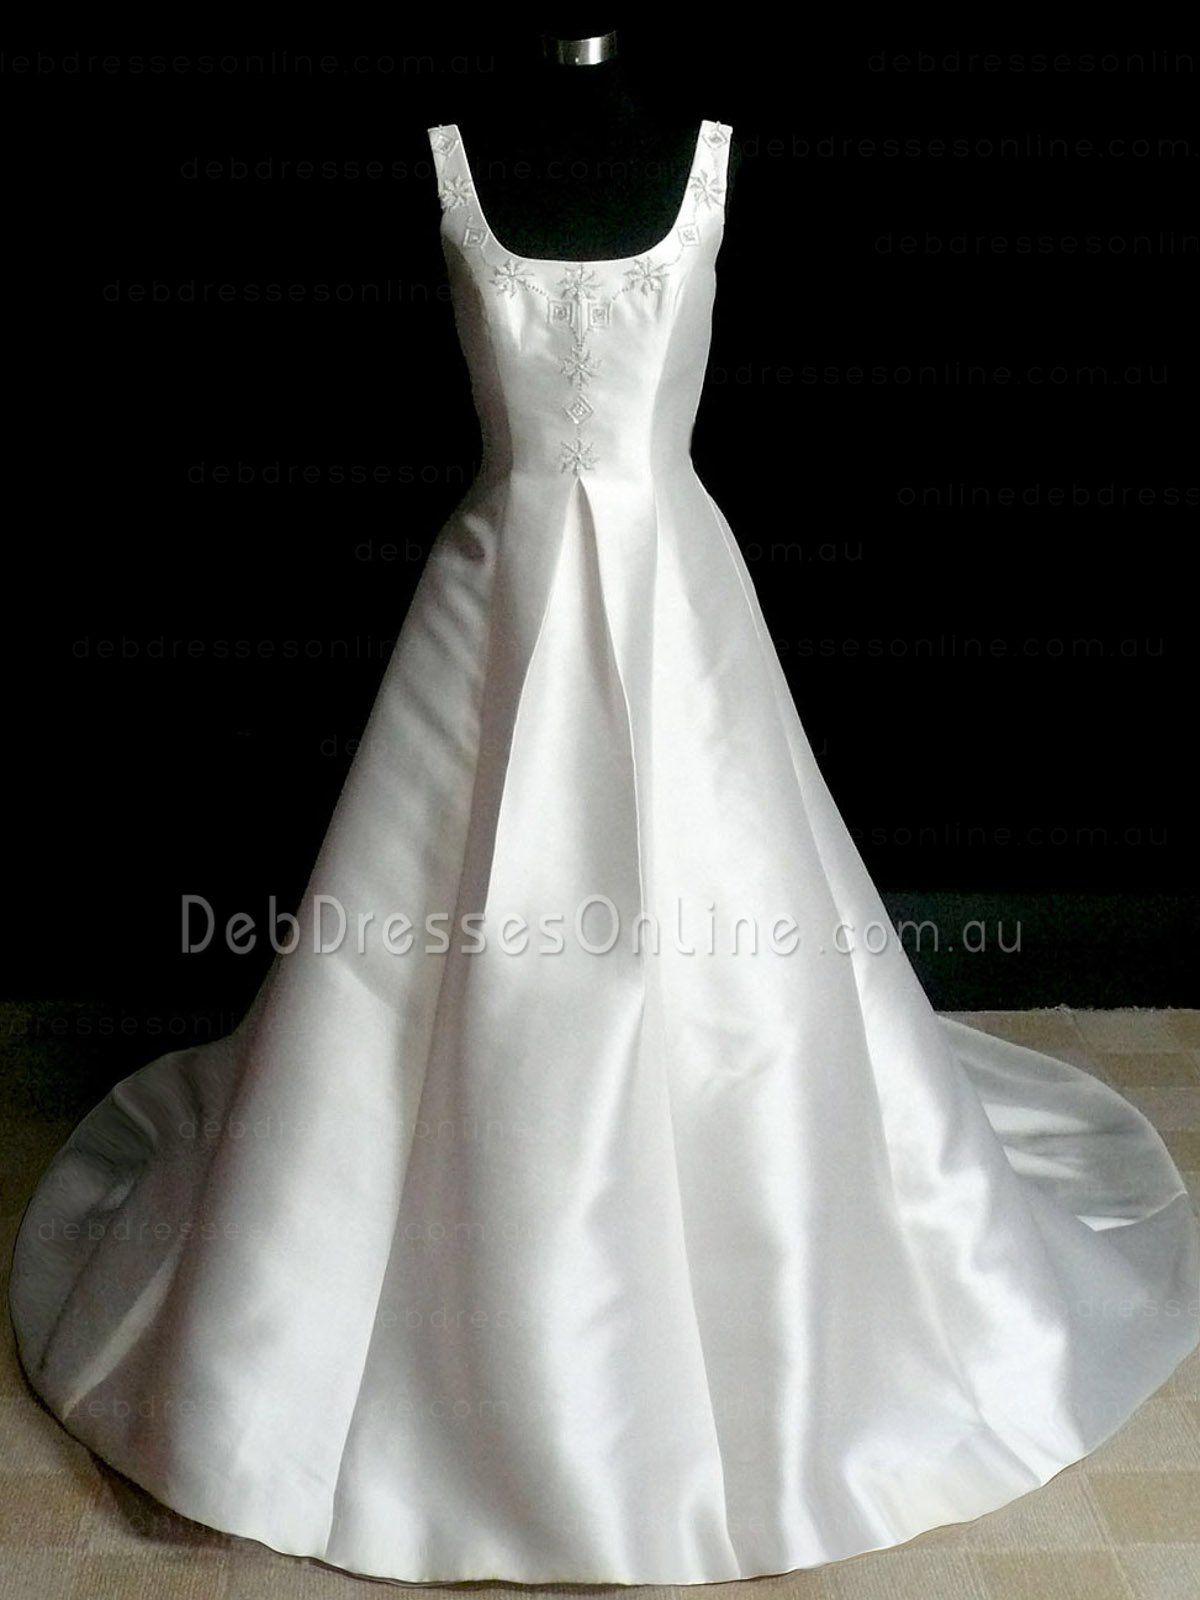 Deb Dresses Online